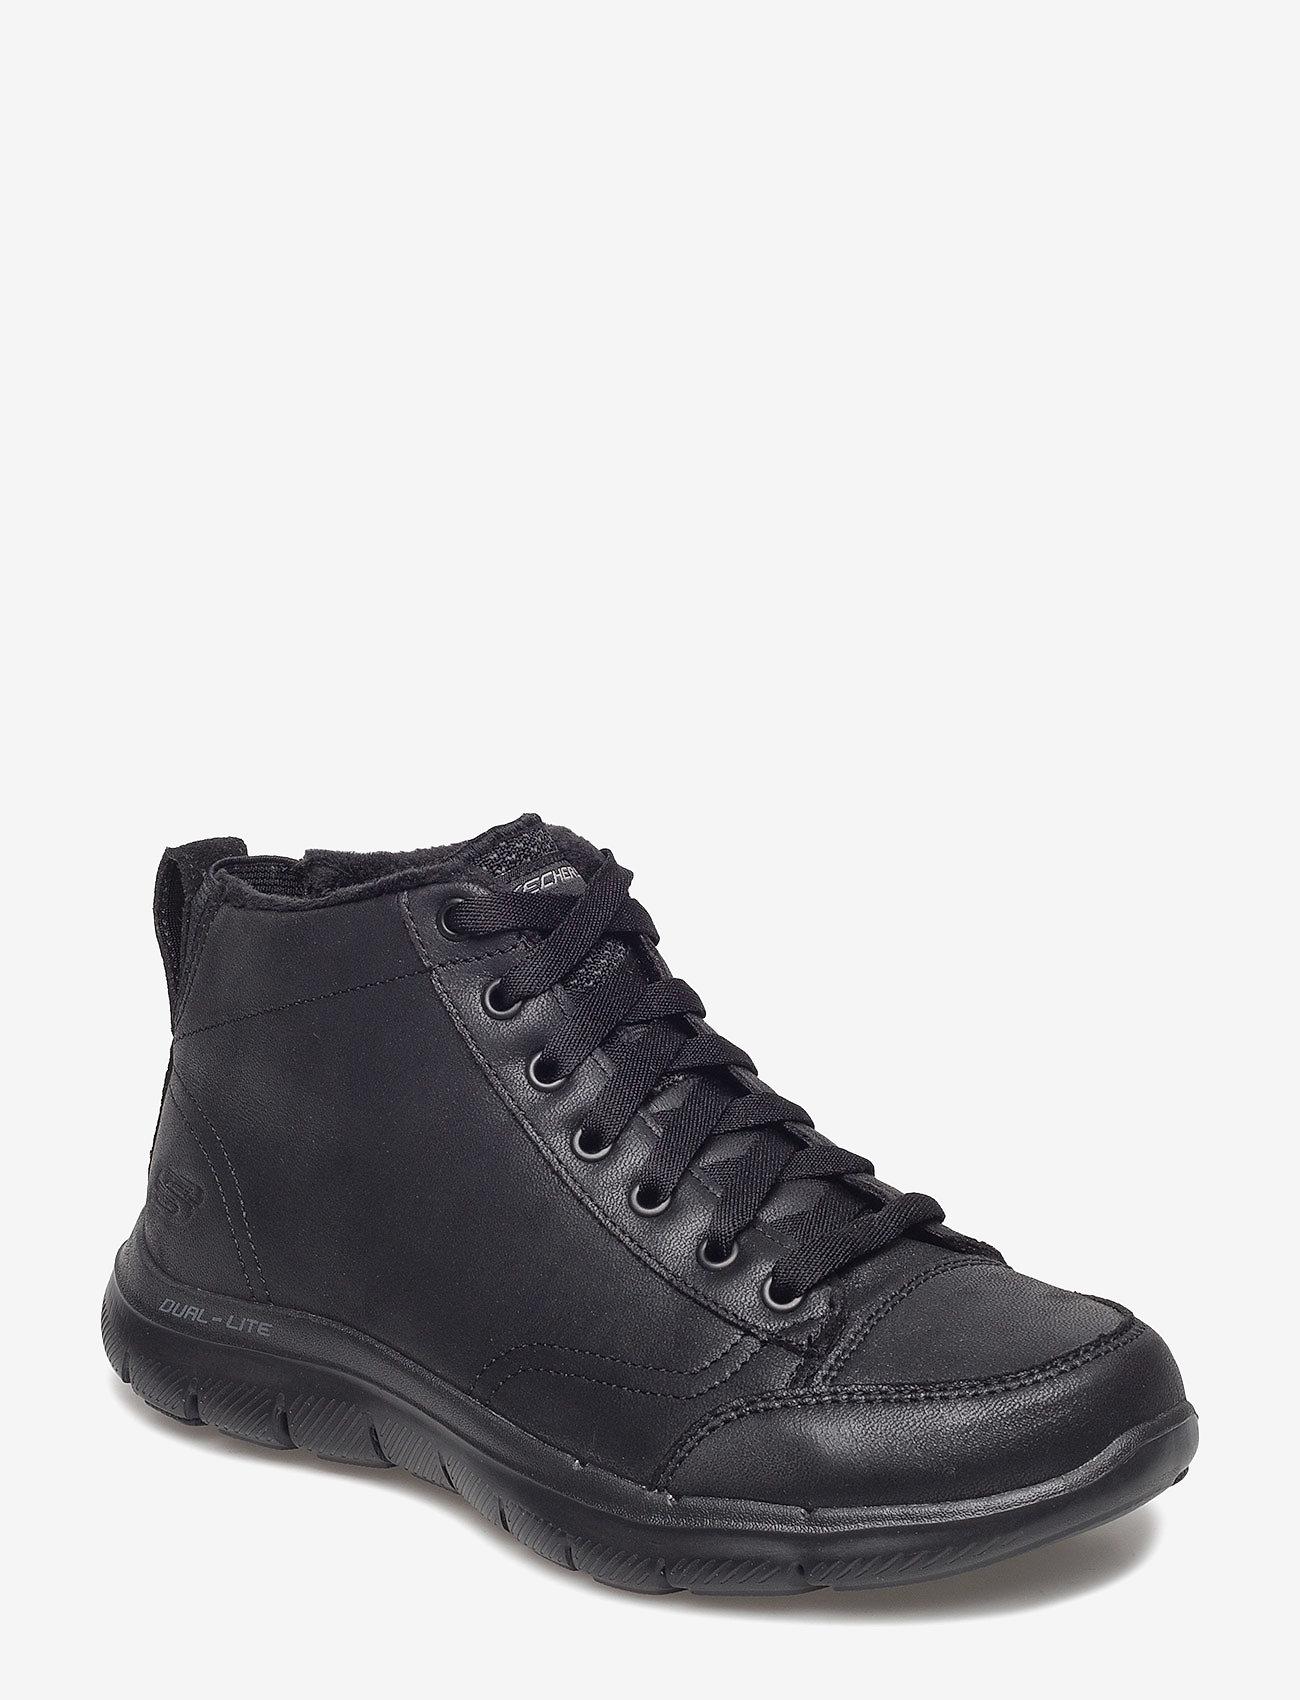 Críticamente moral Lidiar con  Womens Flex Appeal 2.0 - Warm Wishes (Bbk Black) (69.30 €) - Skechers -    Boozt.com